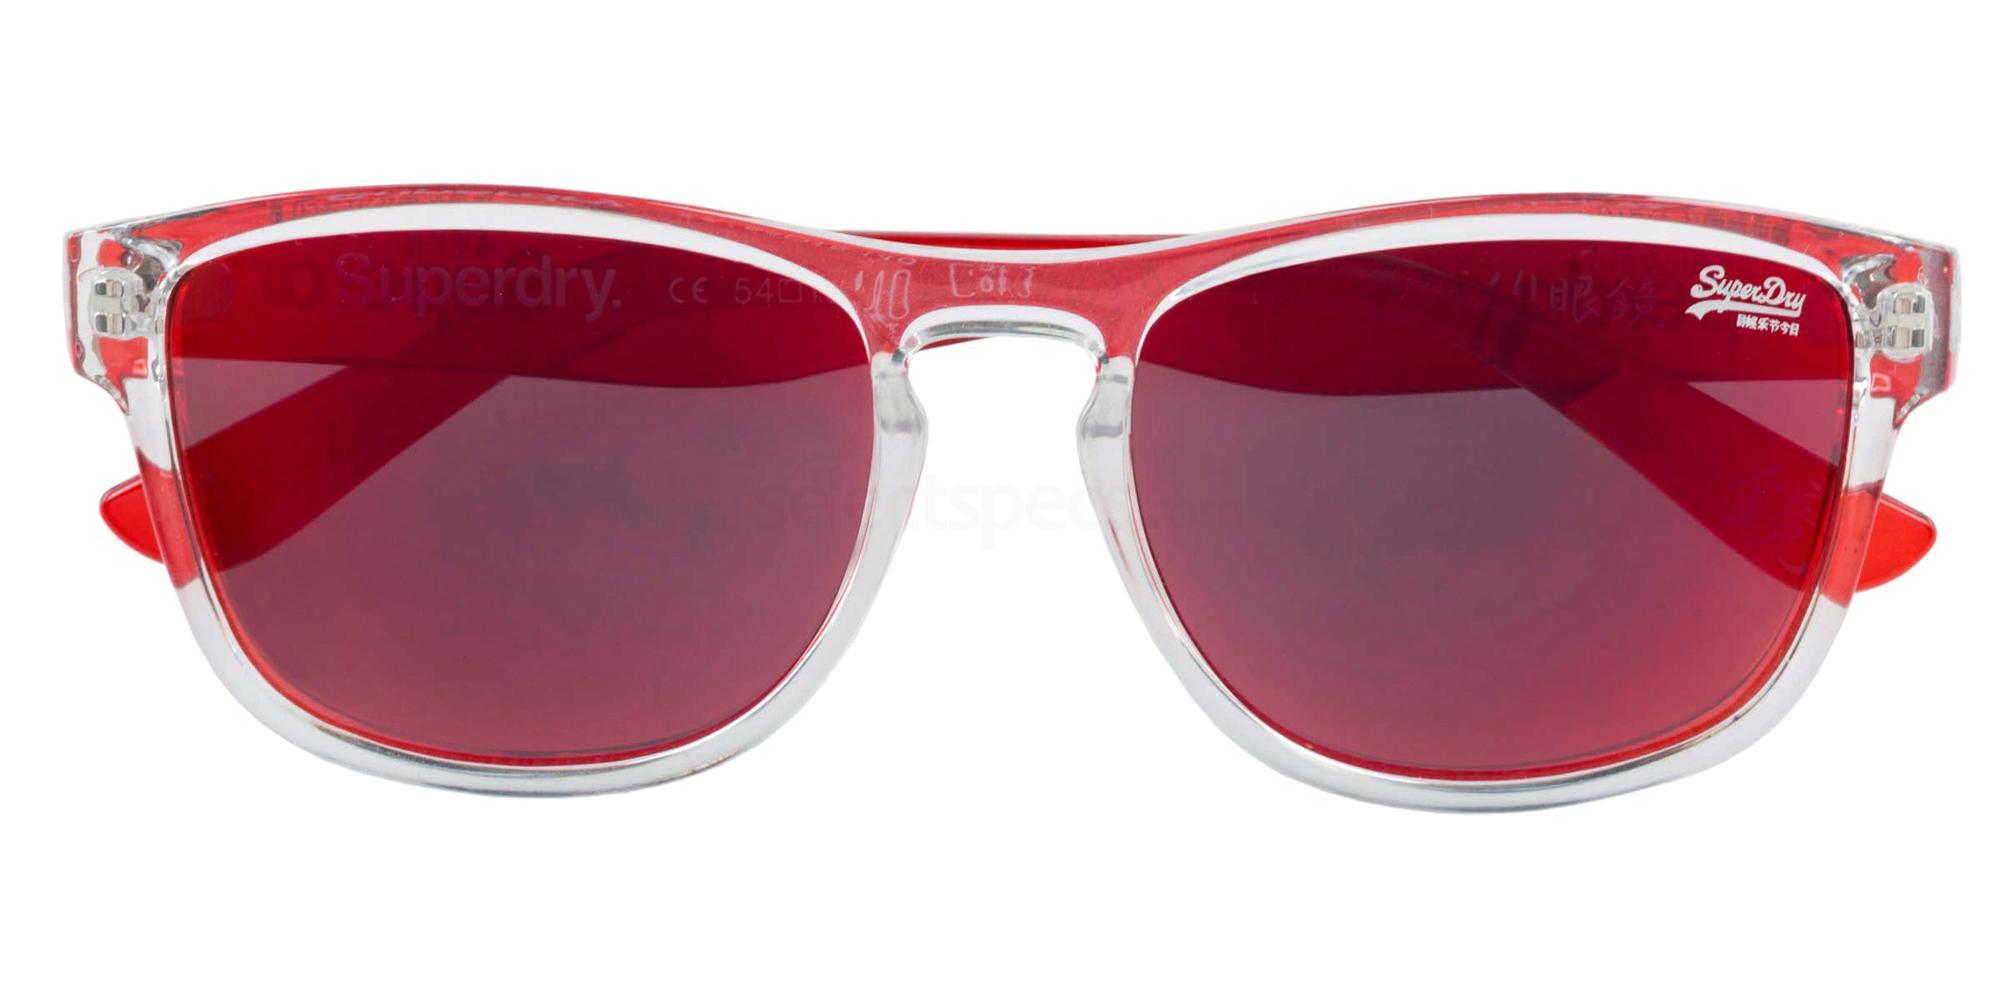 186 SDS-ROCKSTAR Sunglasses, Superdry